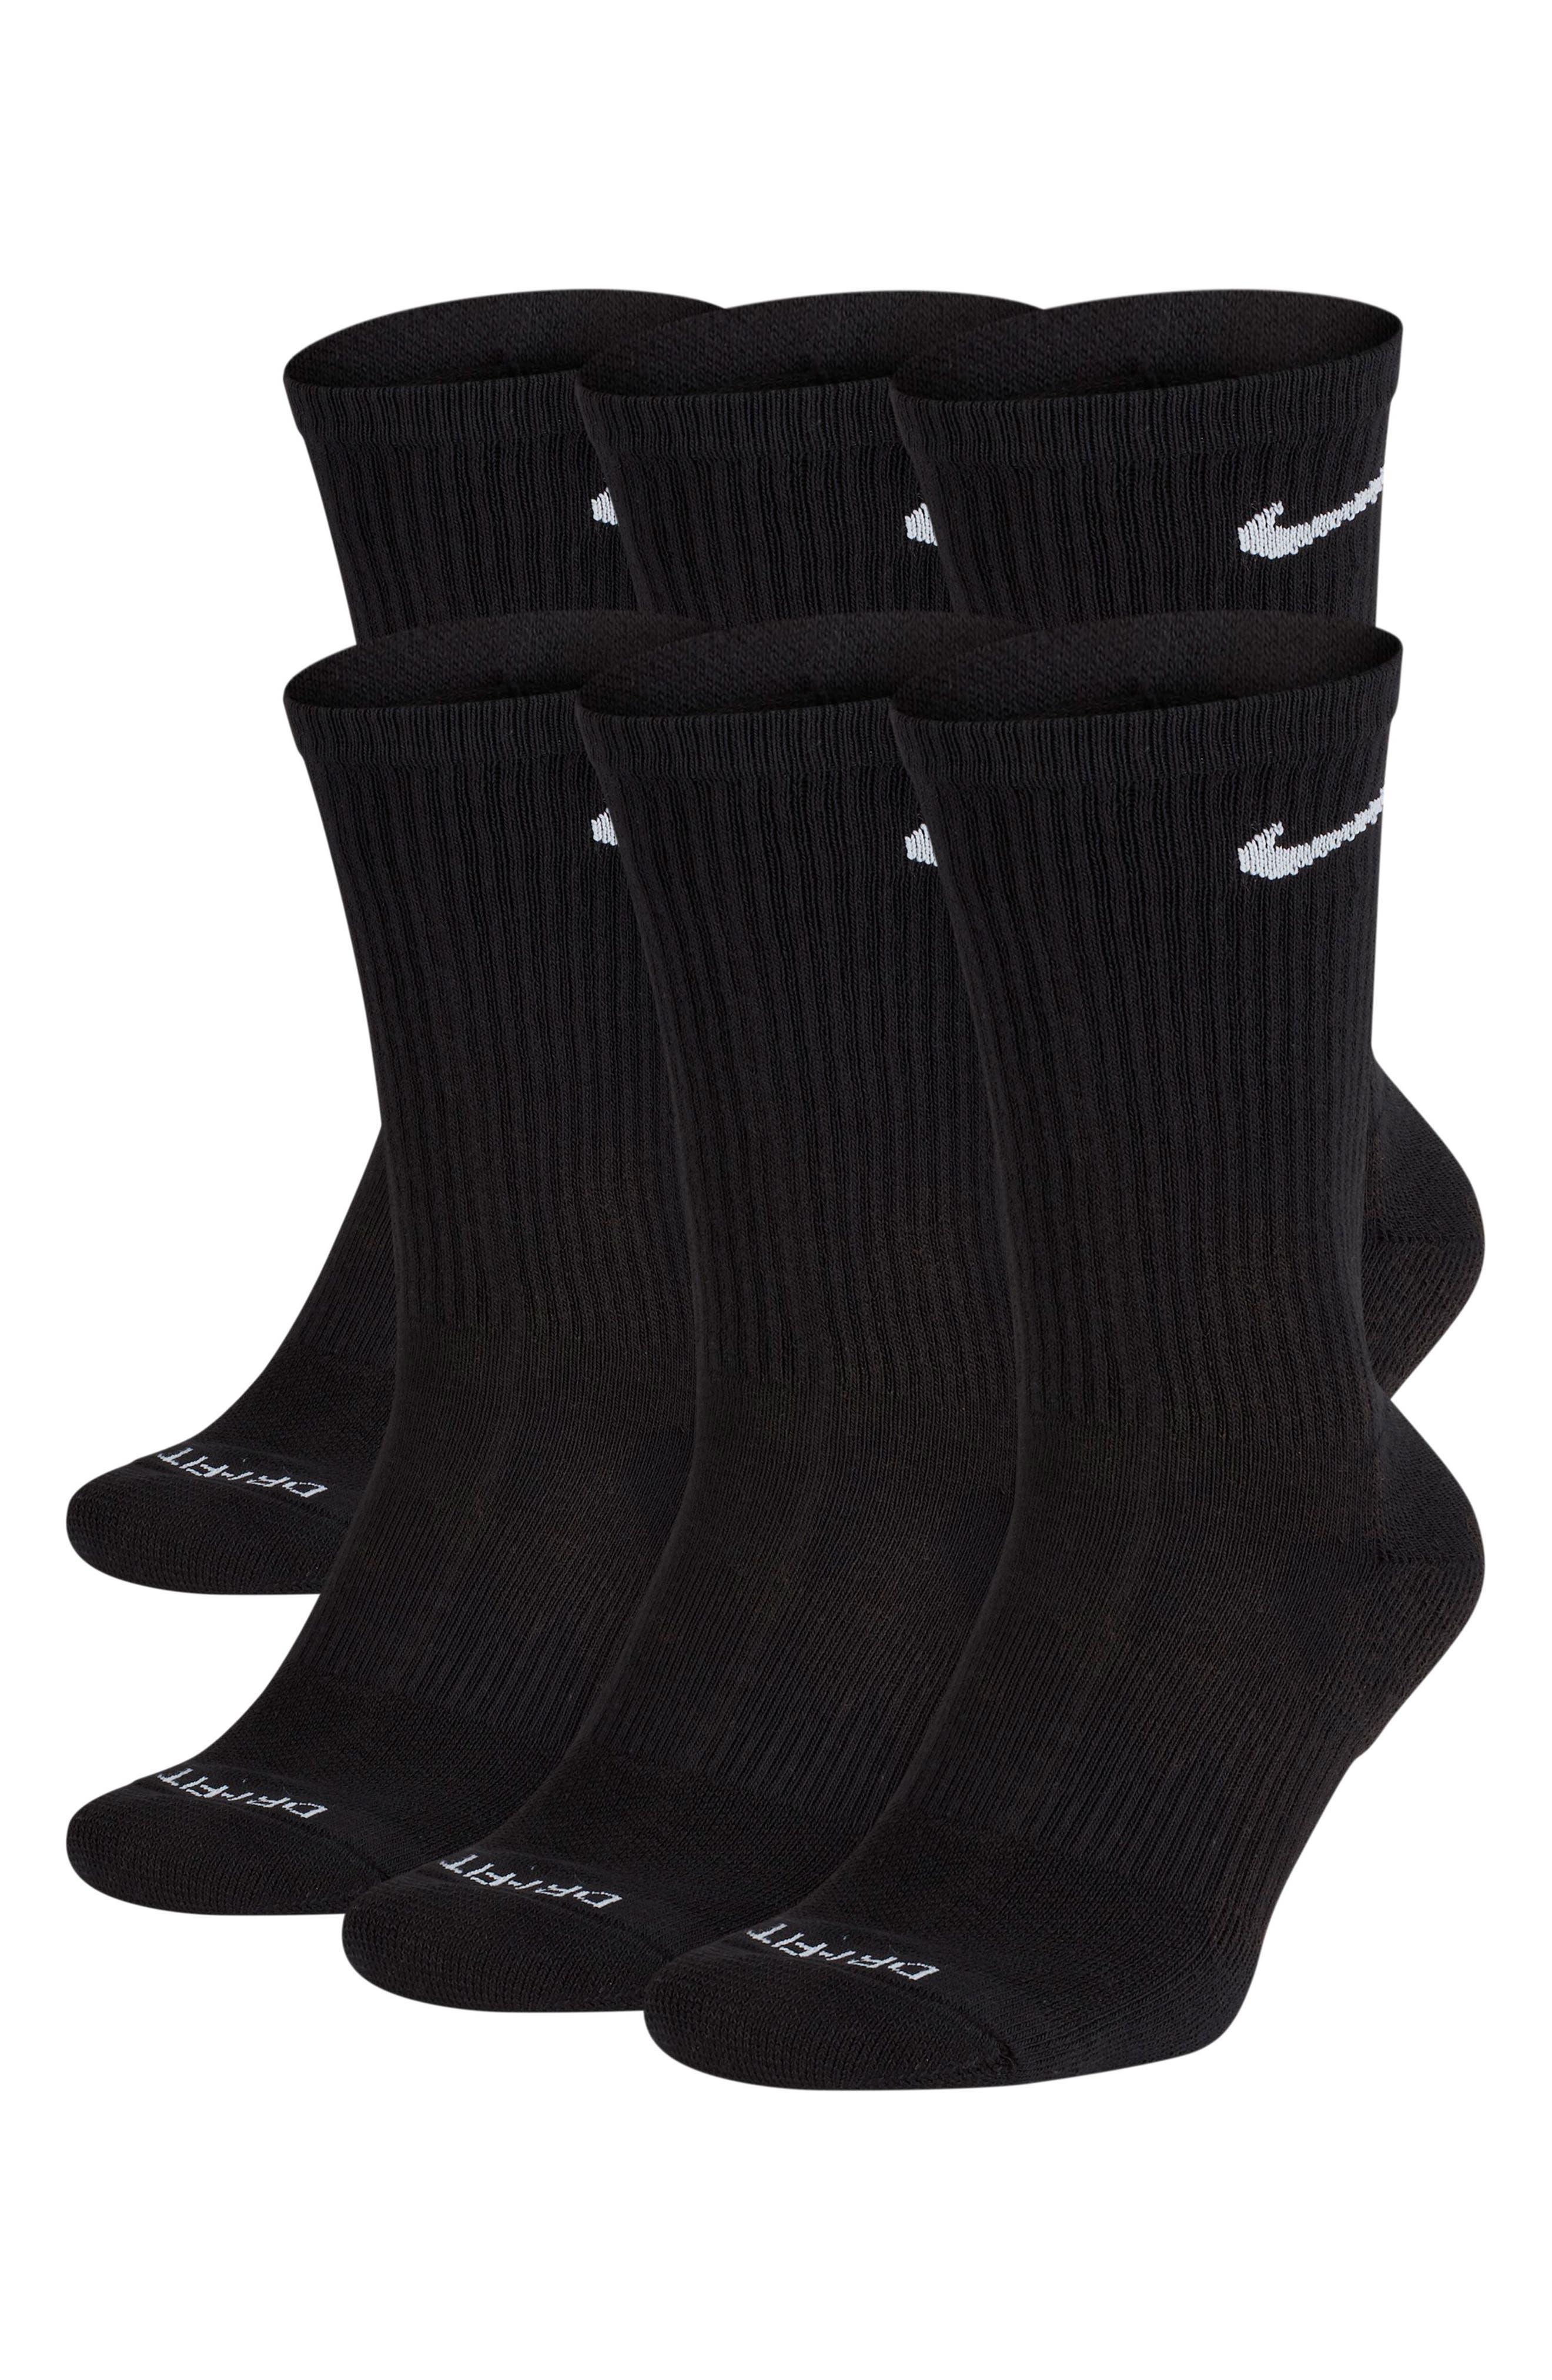 NIKE Dry 6-Pack Everyday Plus Cushion Crew Training Socks, Main, color, BLACK/ WHITE